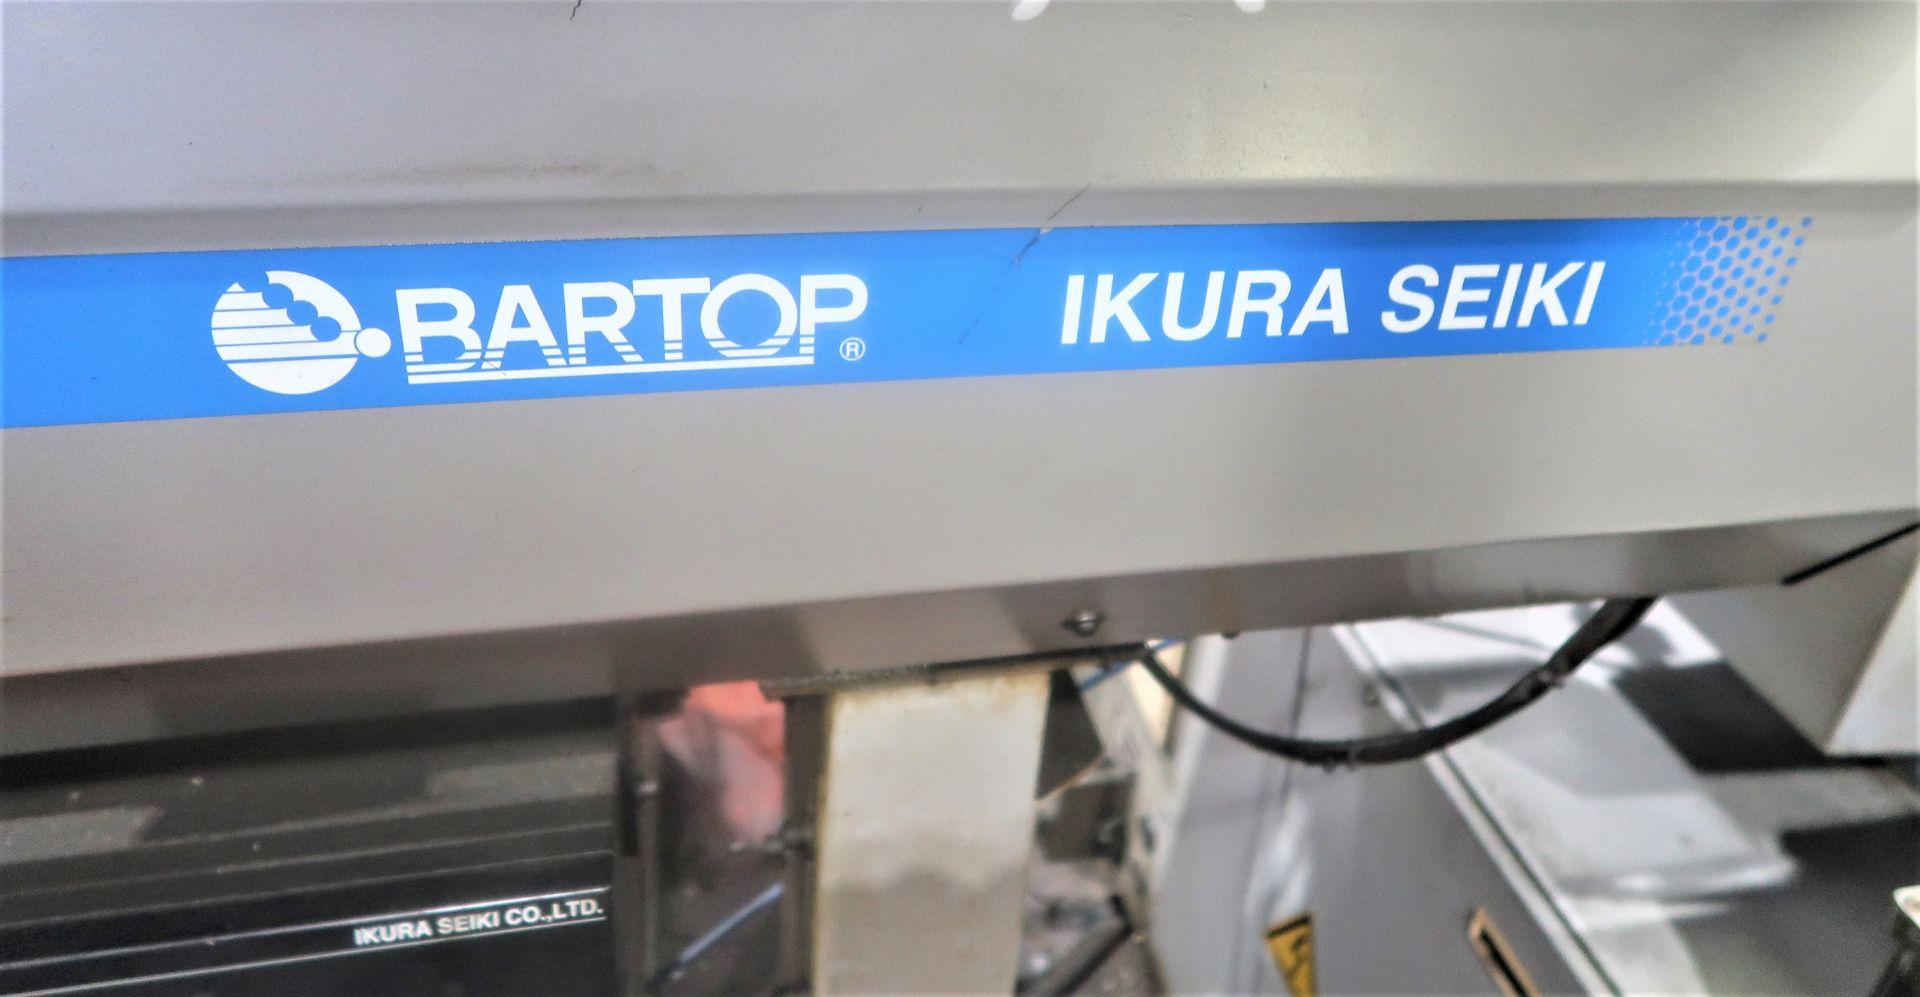 Lot 35 - 20mm Star Ecas-20 CNC Swiss Type Sliding Headstock Turning Center, S/N 0315(028), New 2005